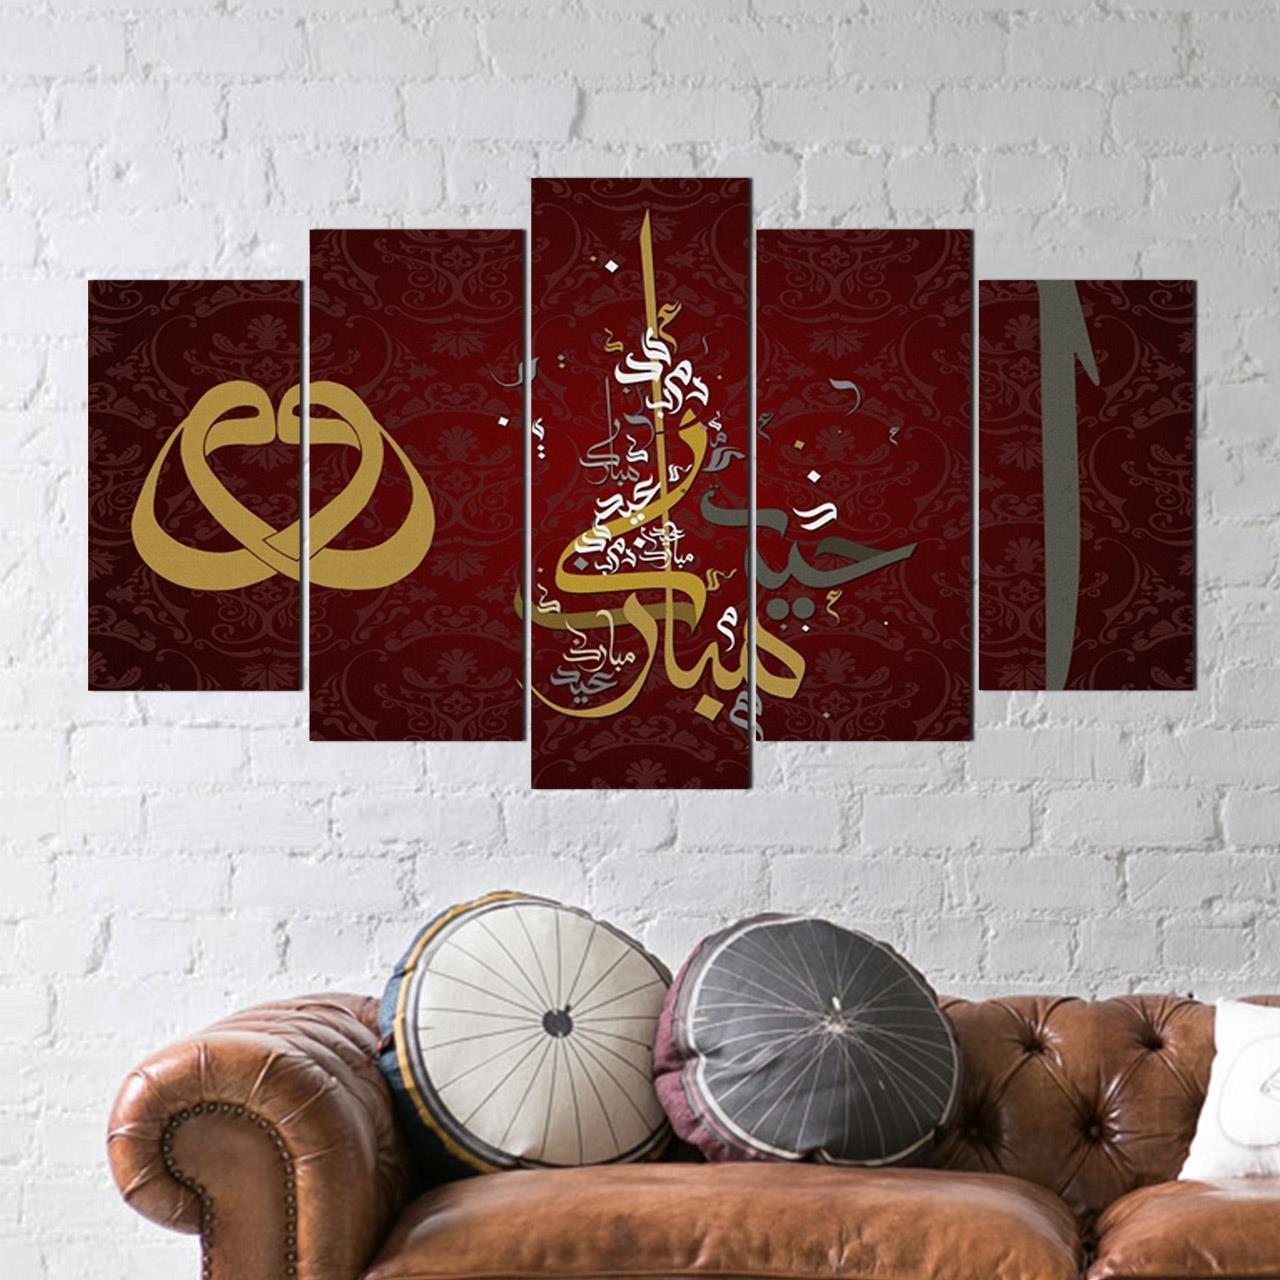 5 teiliges wandbild mdf allah elif vav islamisches symbol. Black Bedroom Furniture Sets. Home Design Ideas